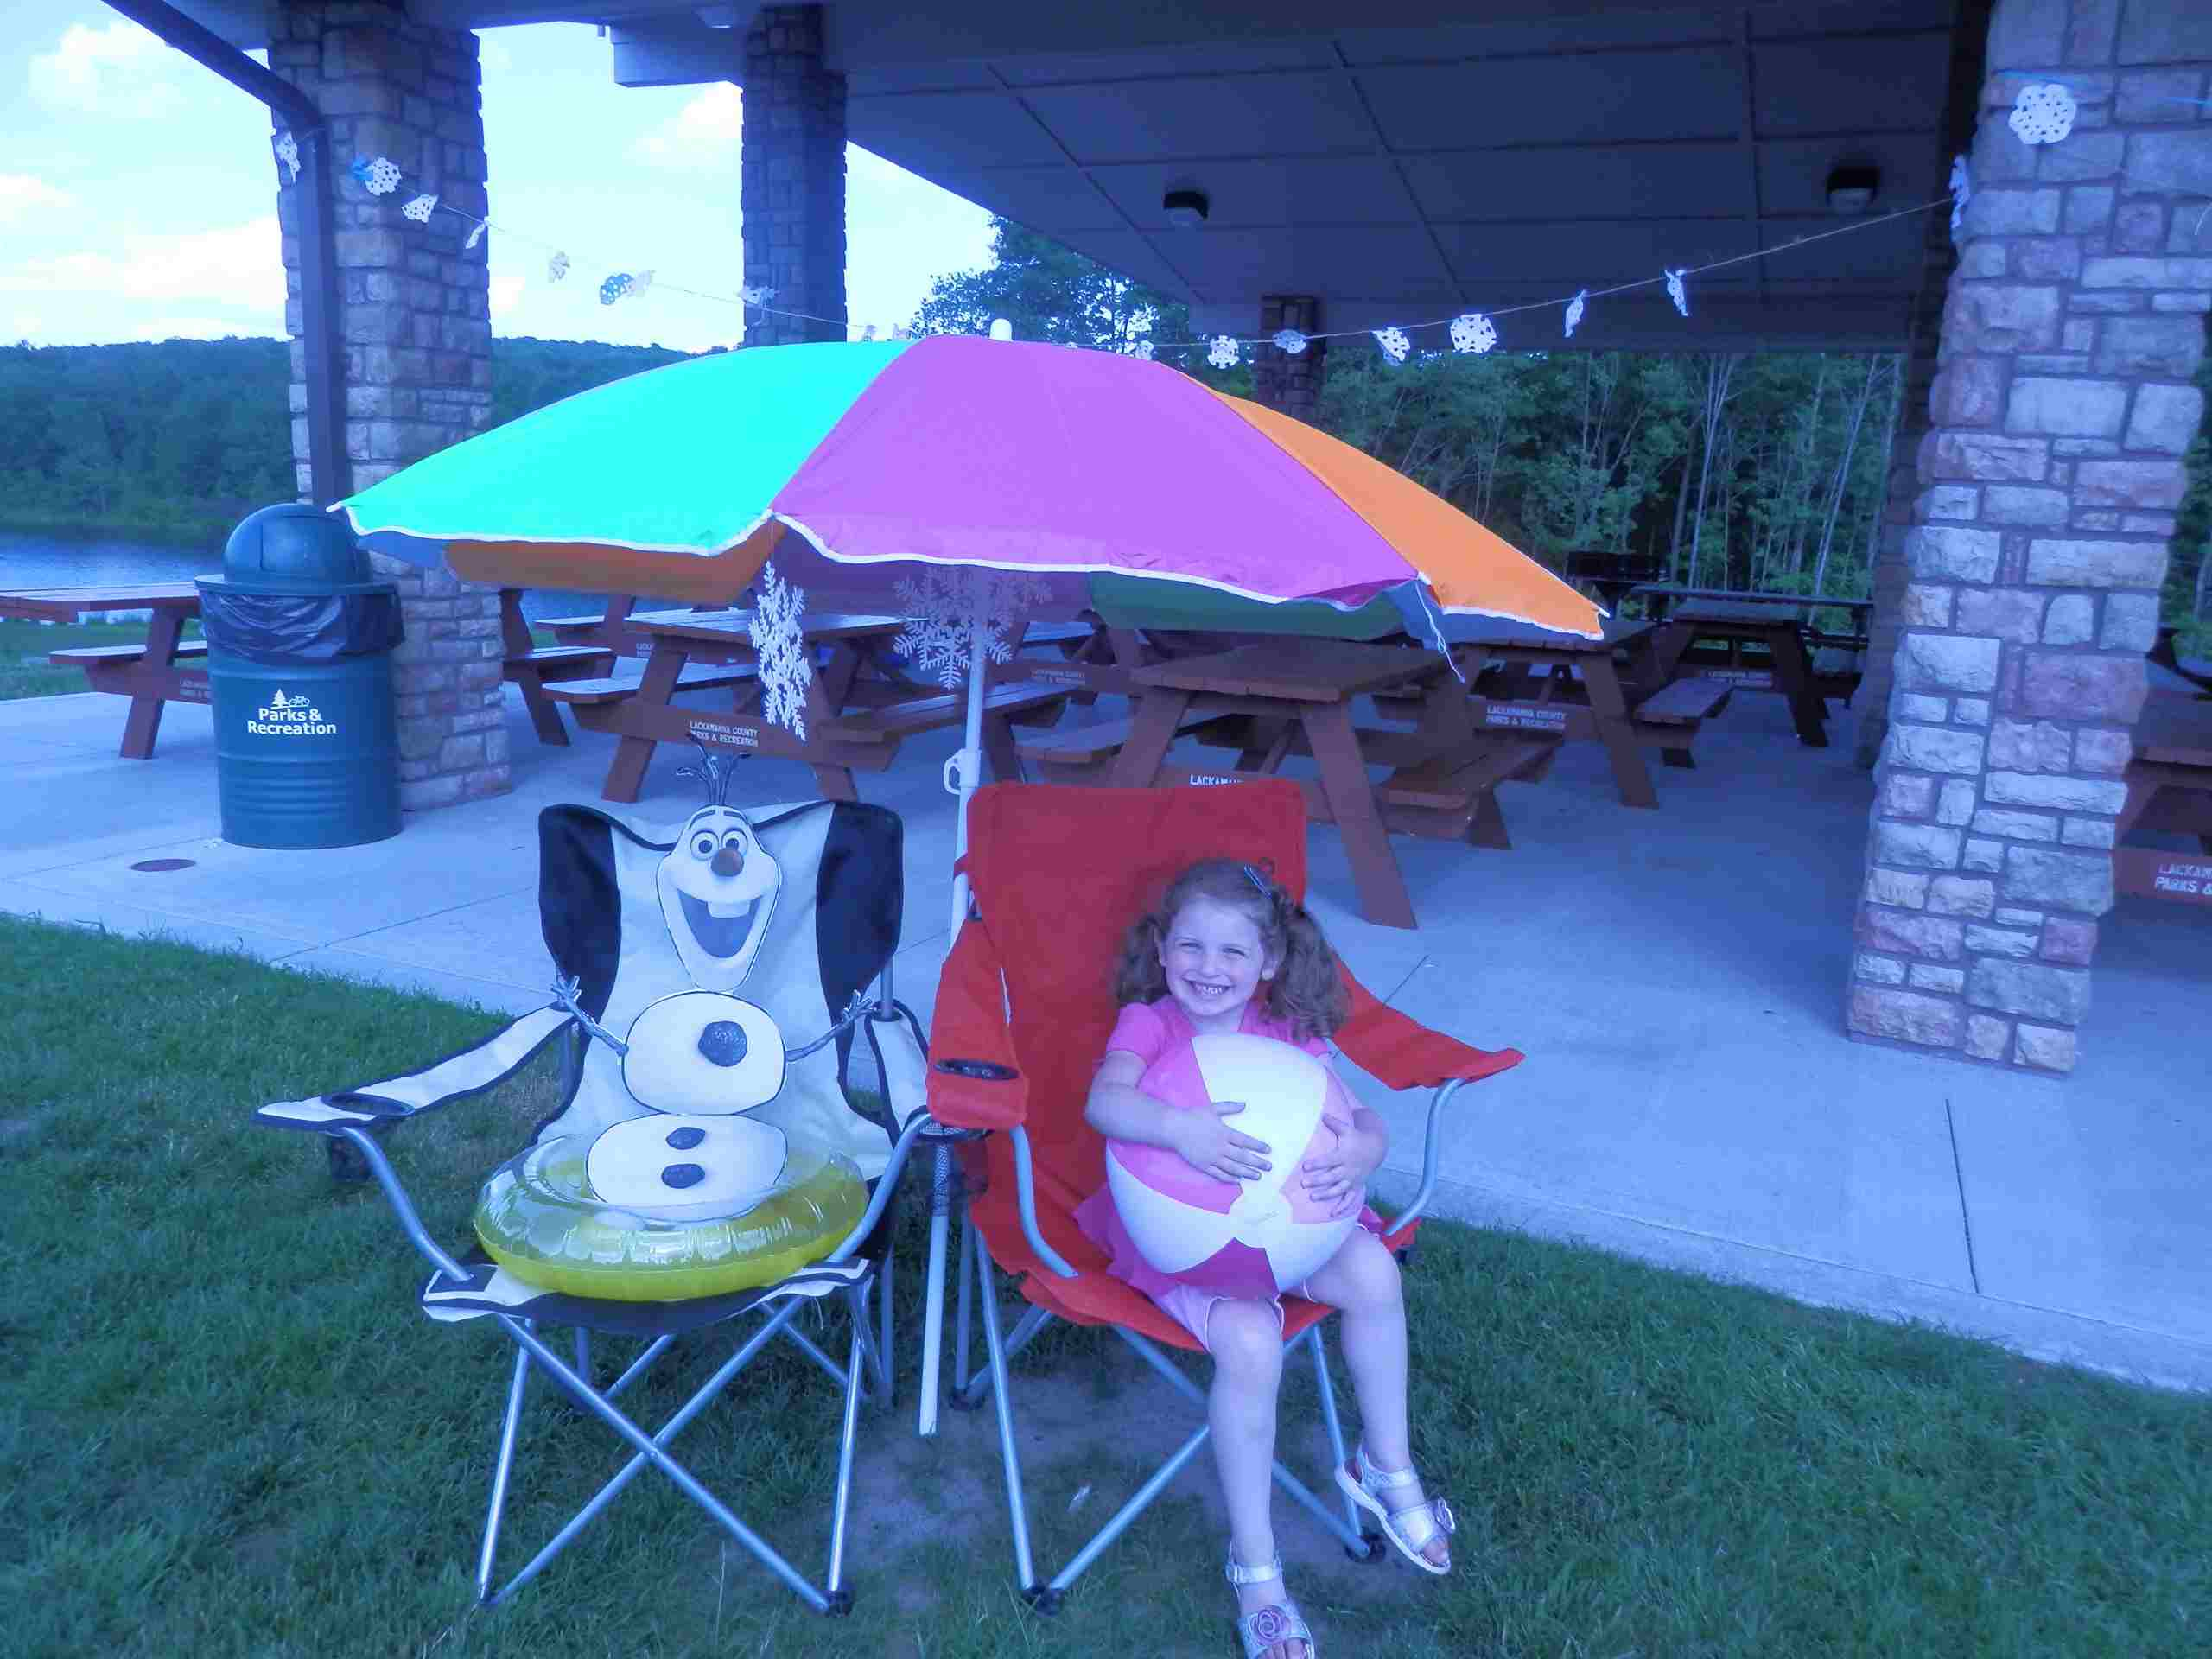 Frozen beach chairs and umbrella